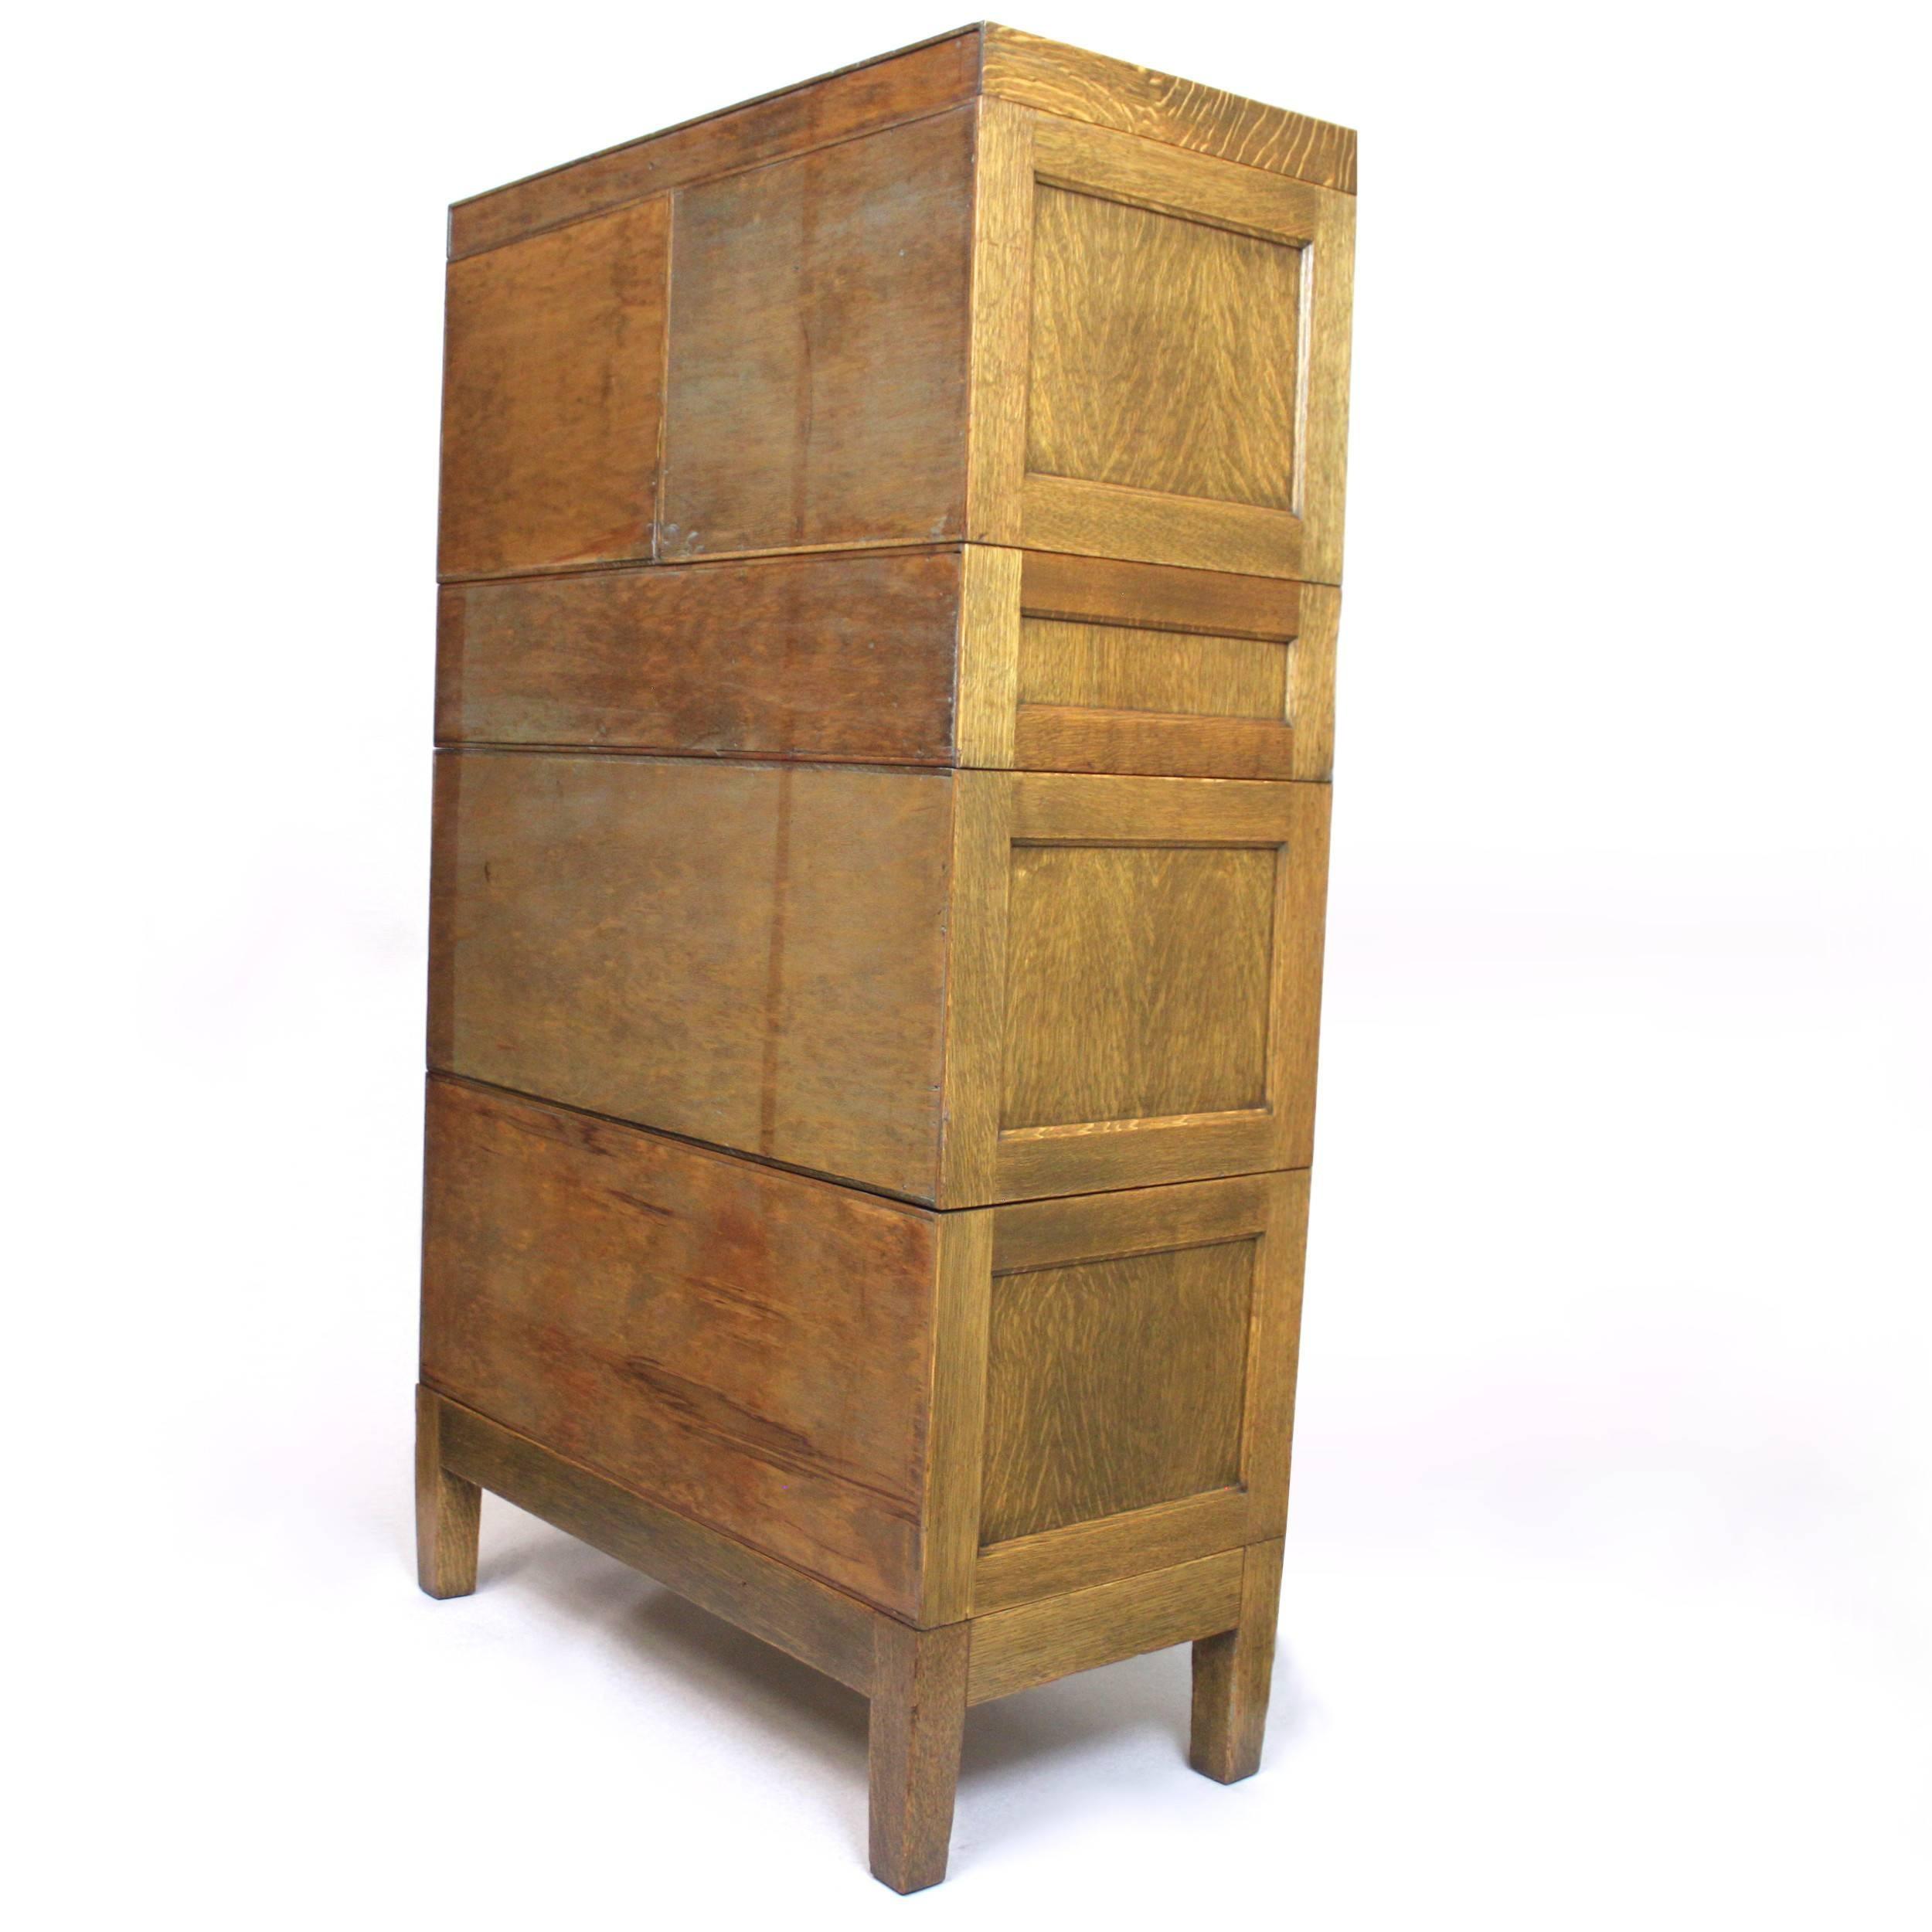 baraudio machine audio furniture modernism vintage other cabinet industrial cabinets metal items shop bar case liquor